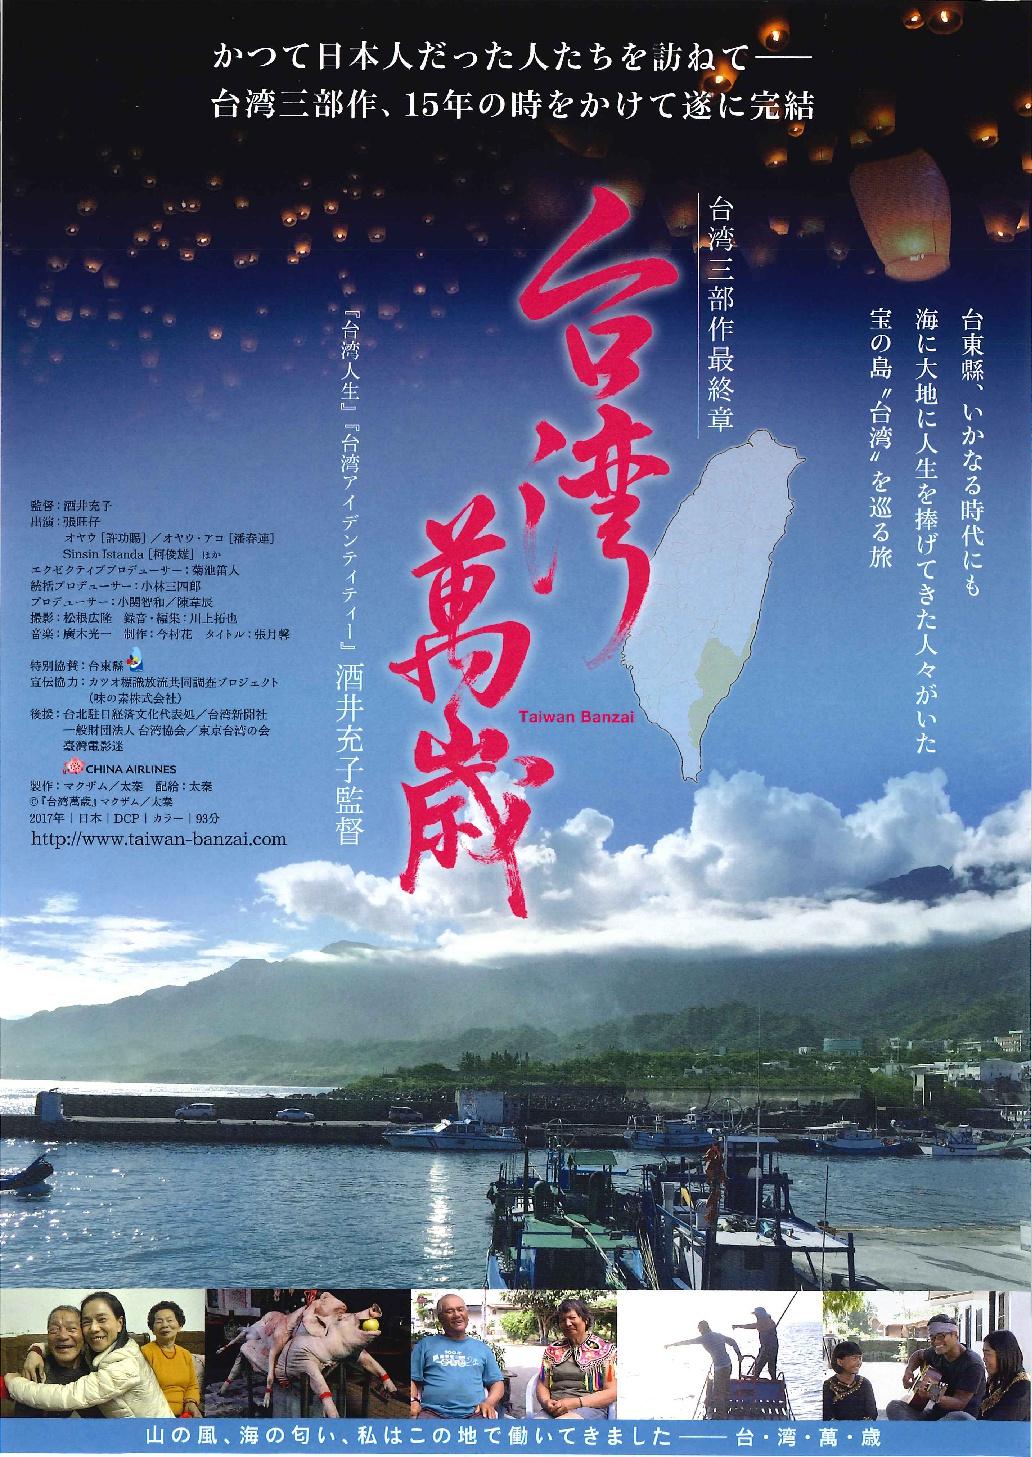 taiwanbanzai_chirashi-0.jpg